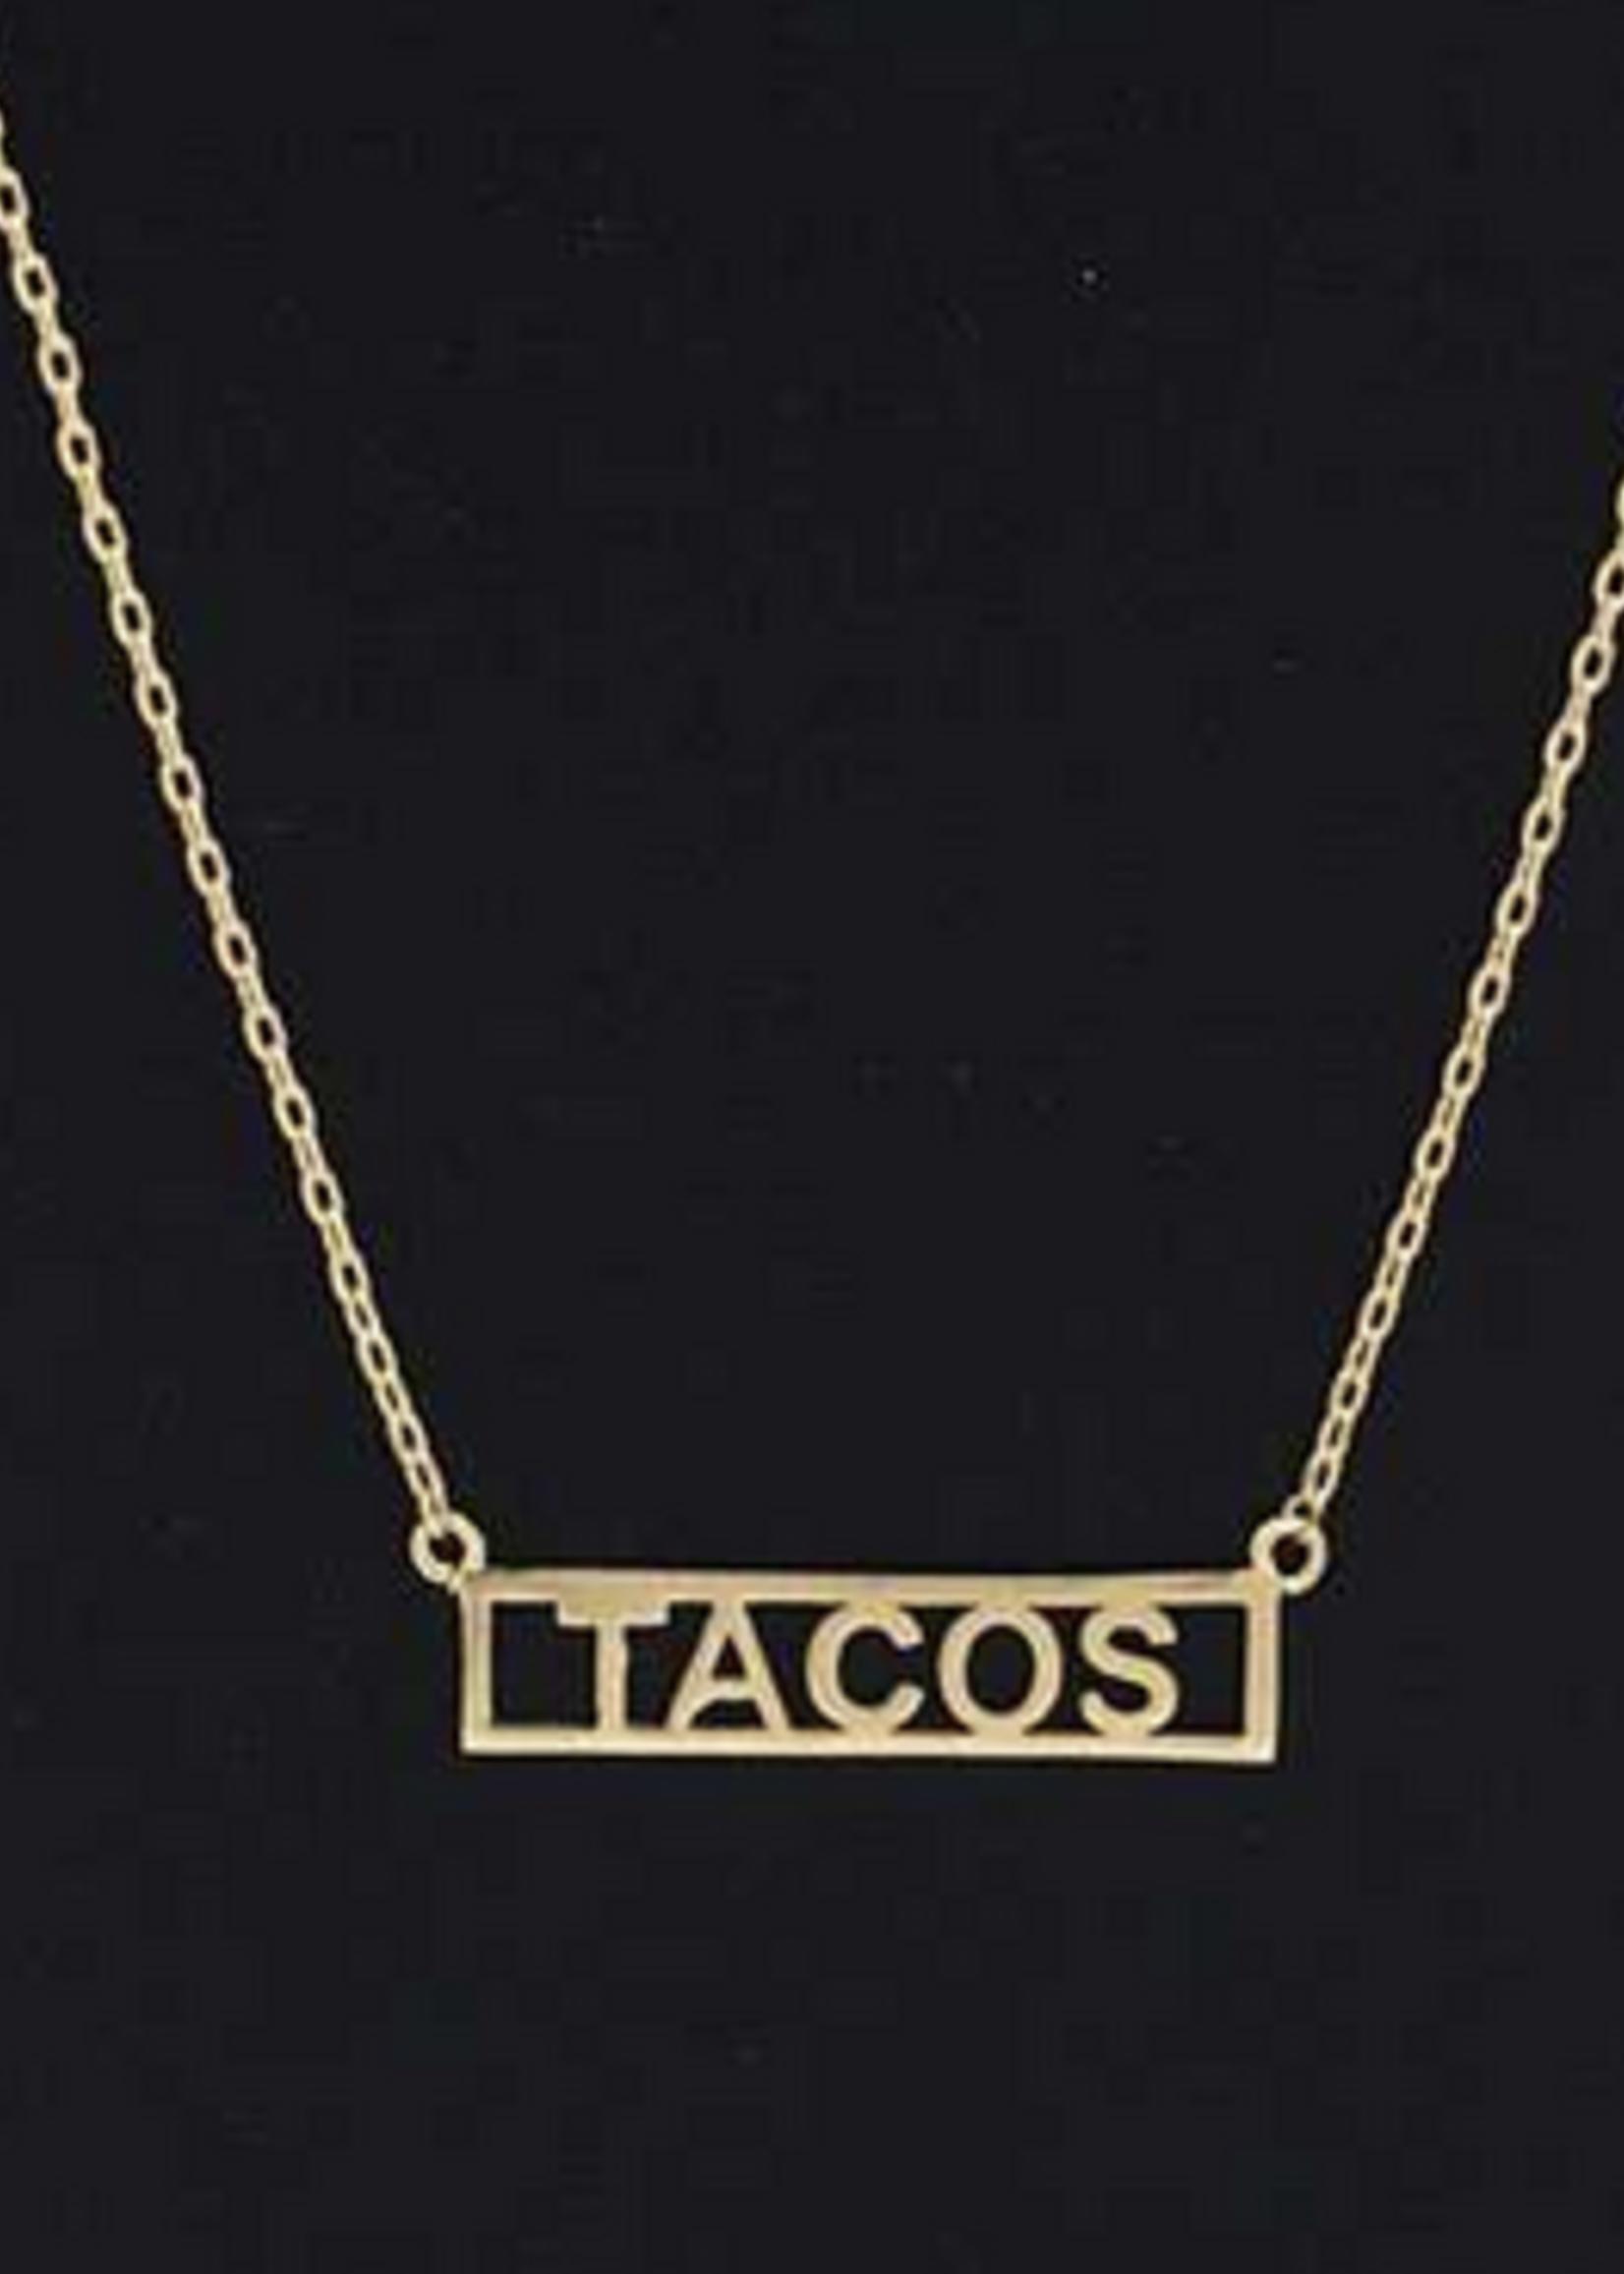 tacos necklace